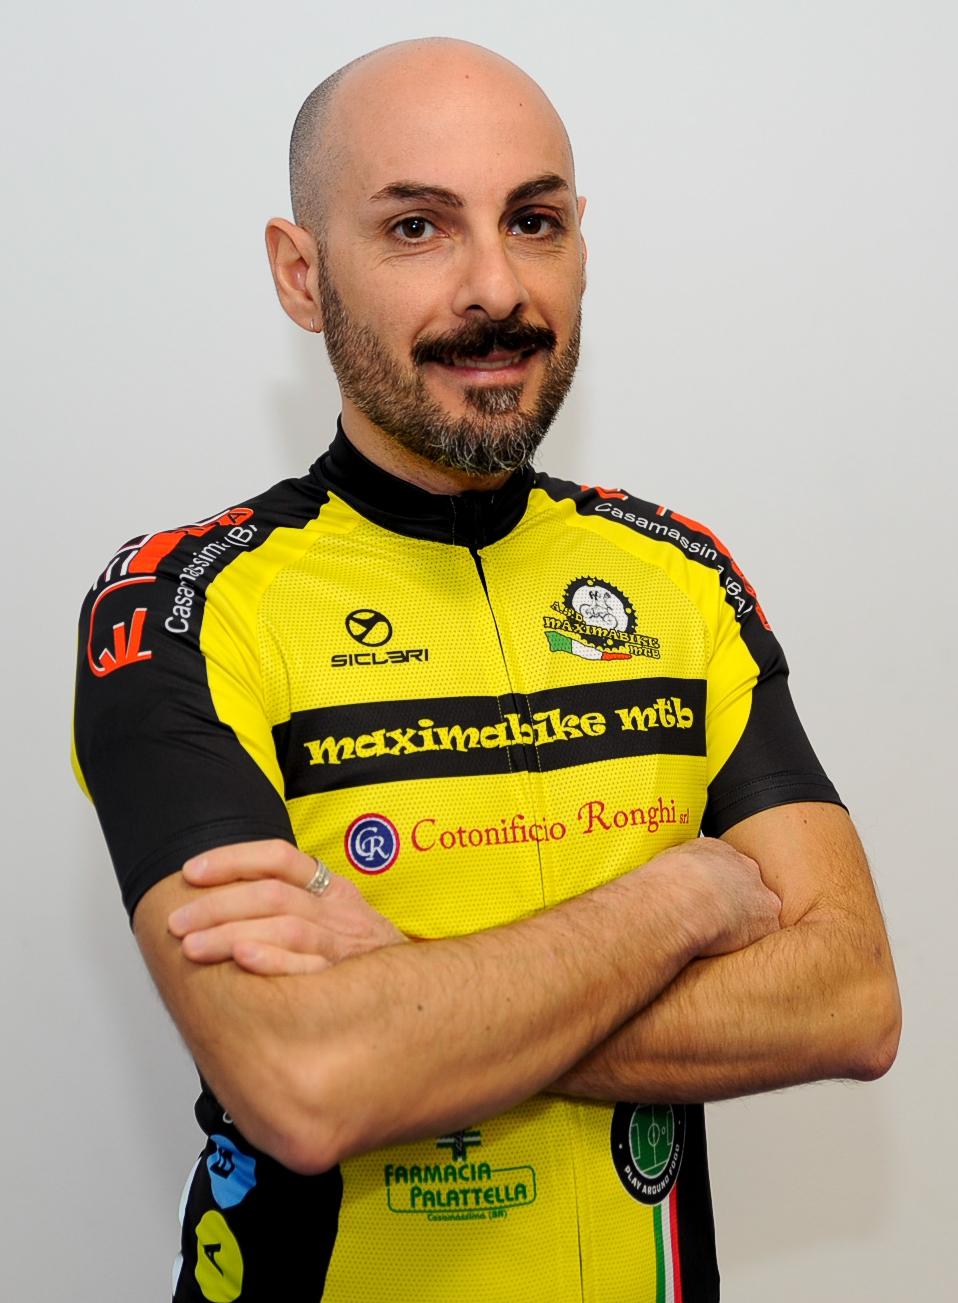 Martello Pietro